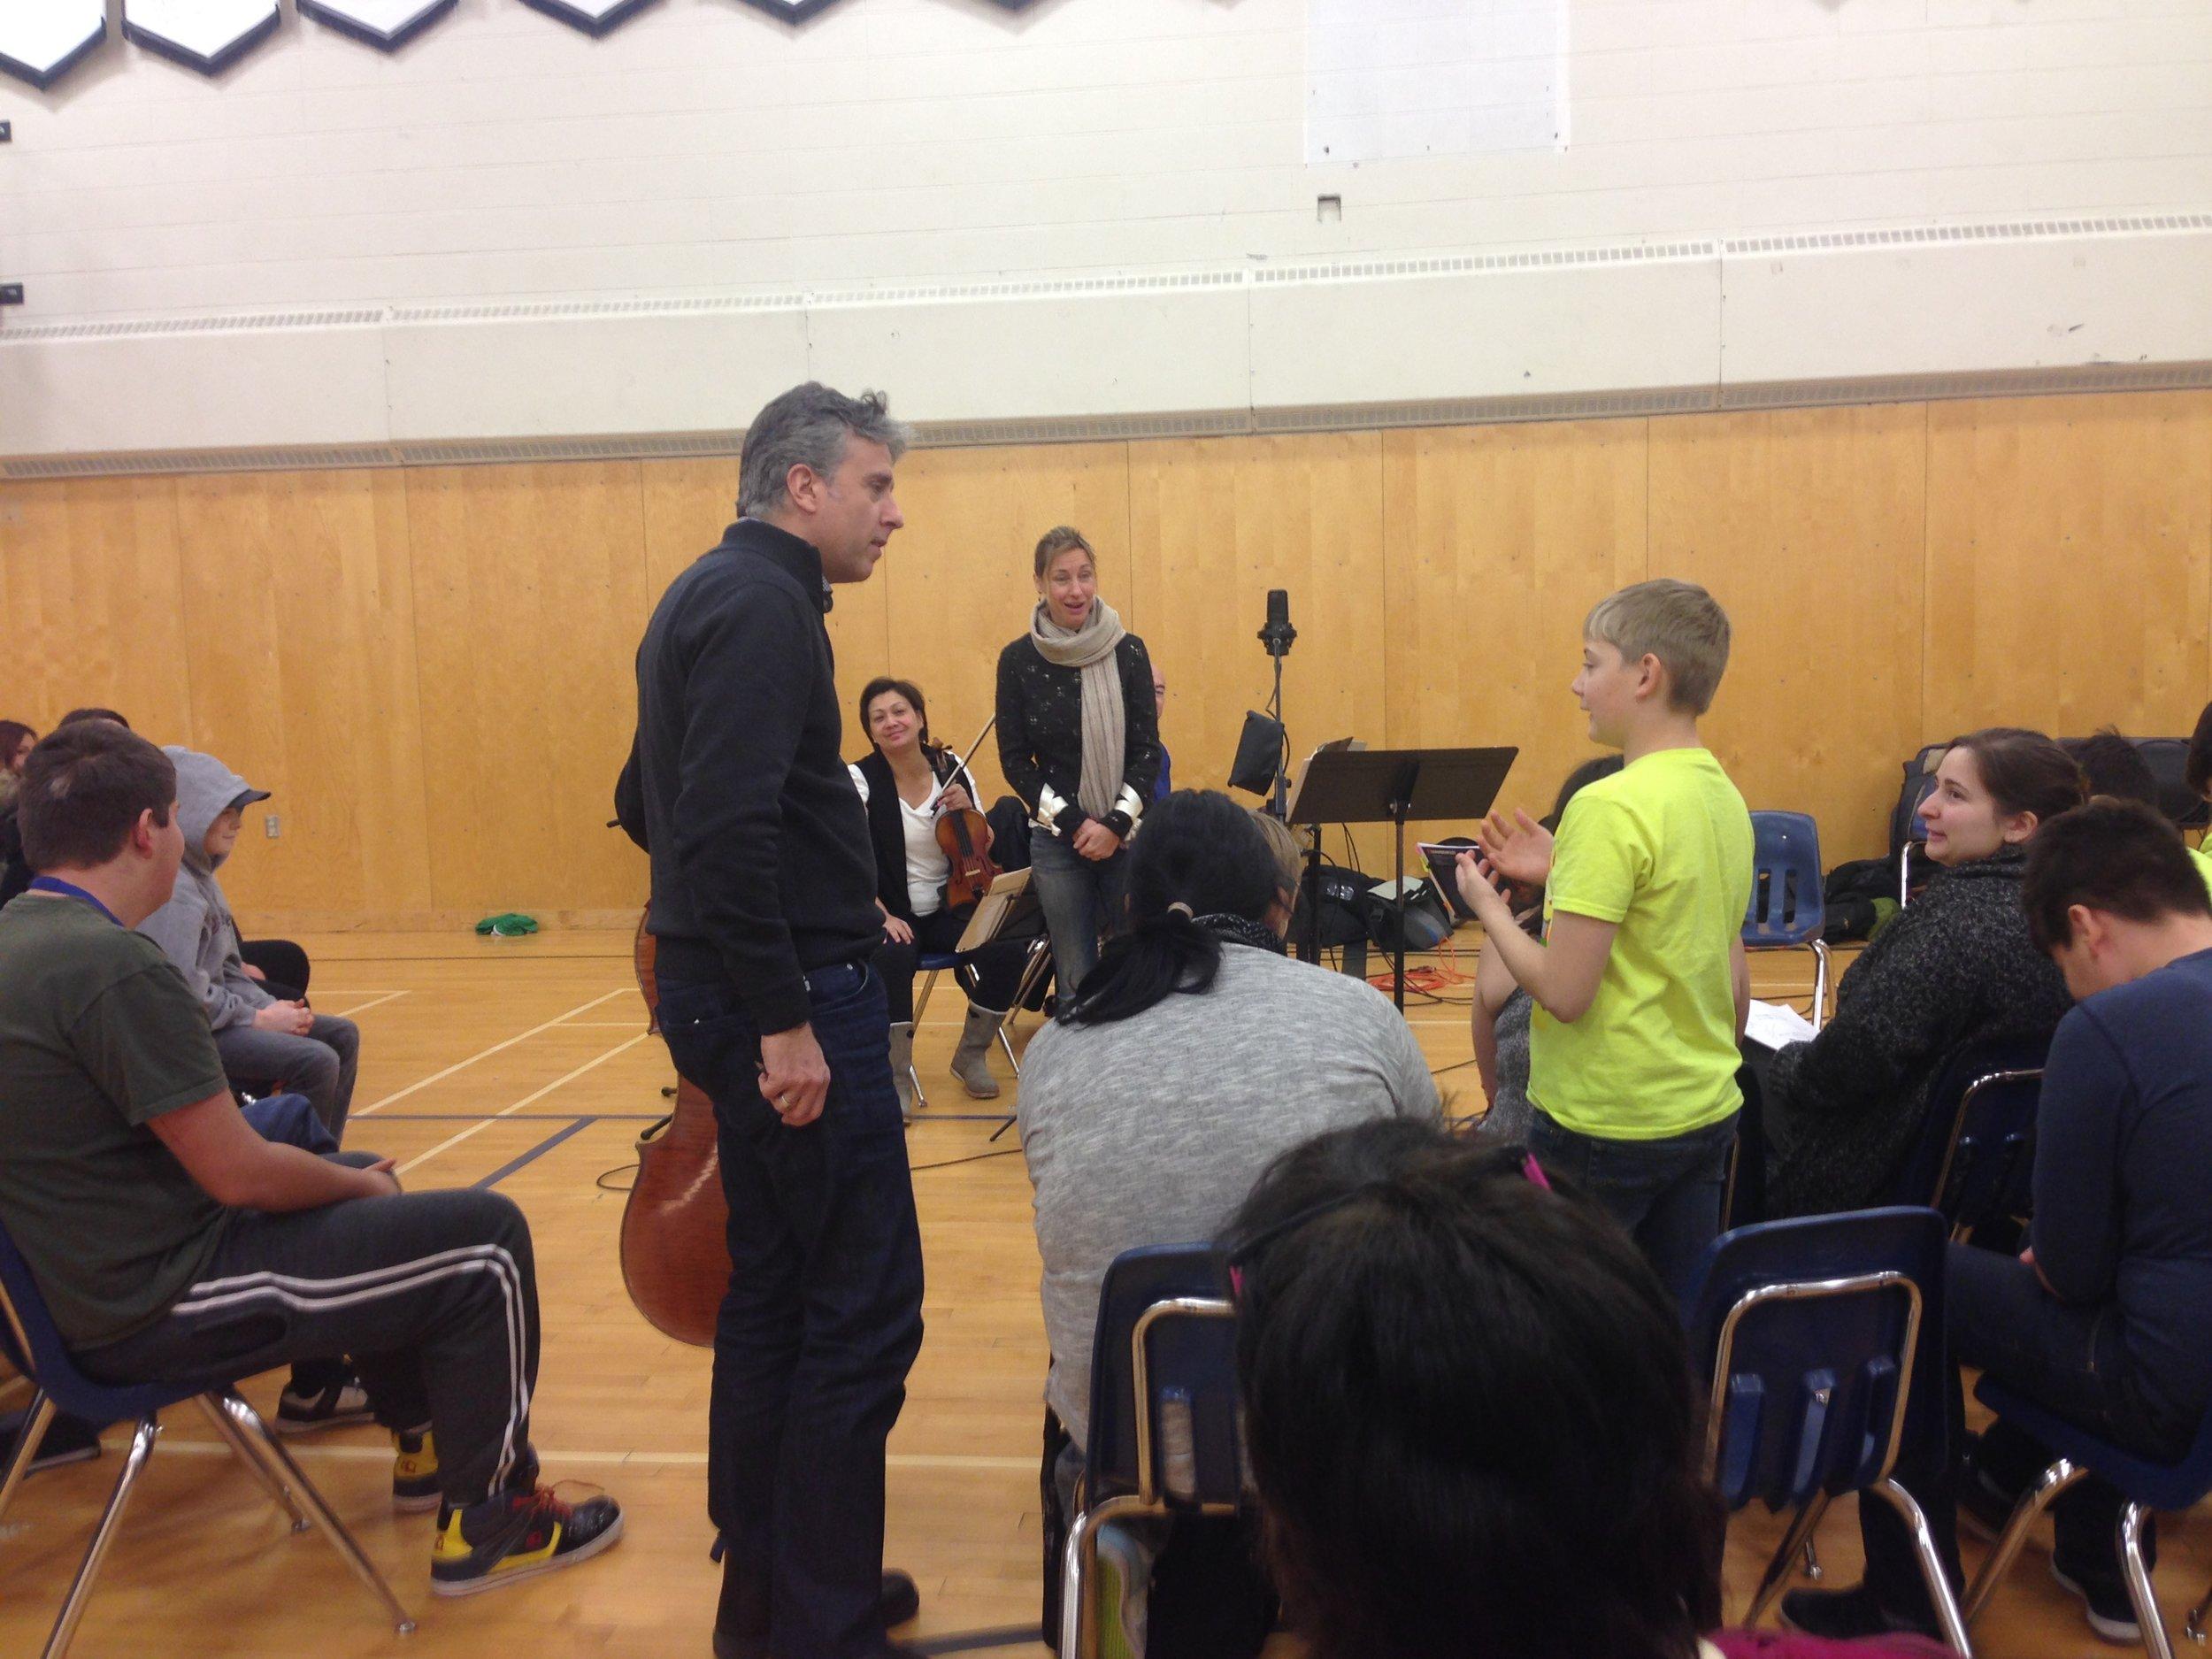 Fort Smith School Concert Gryphon Trio PWK High School IMG_9761.JPG